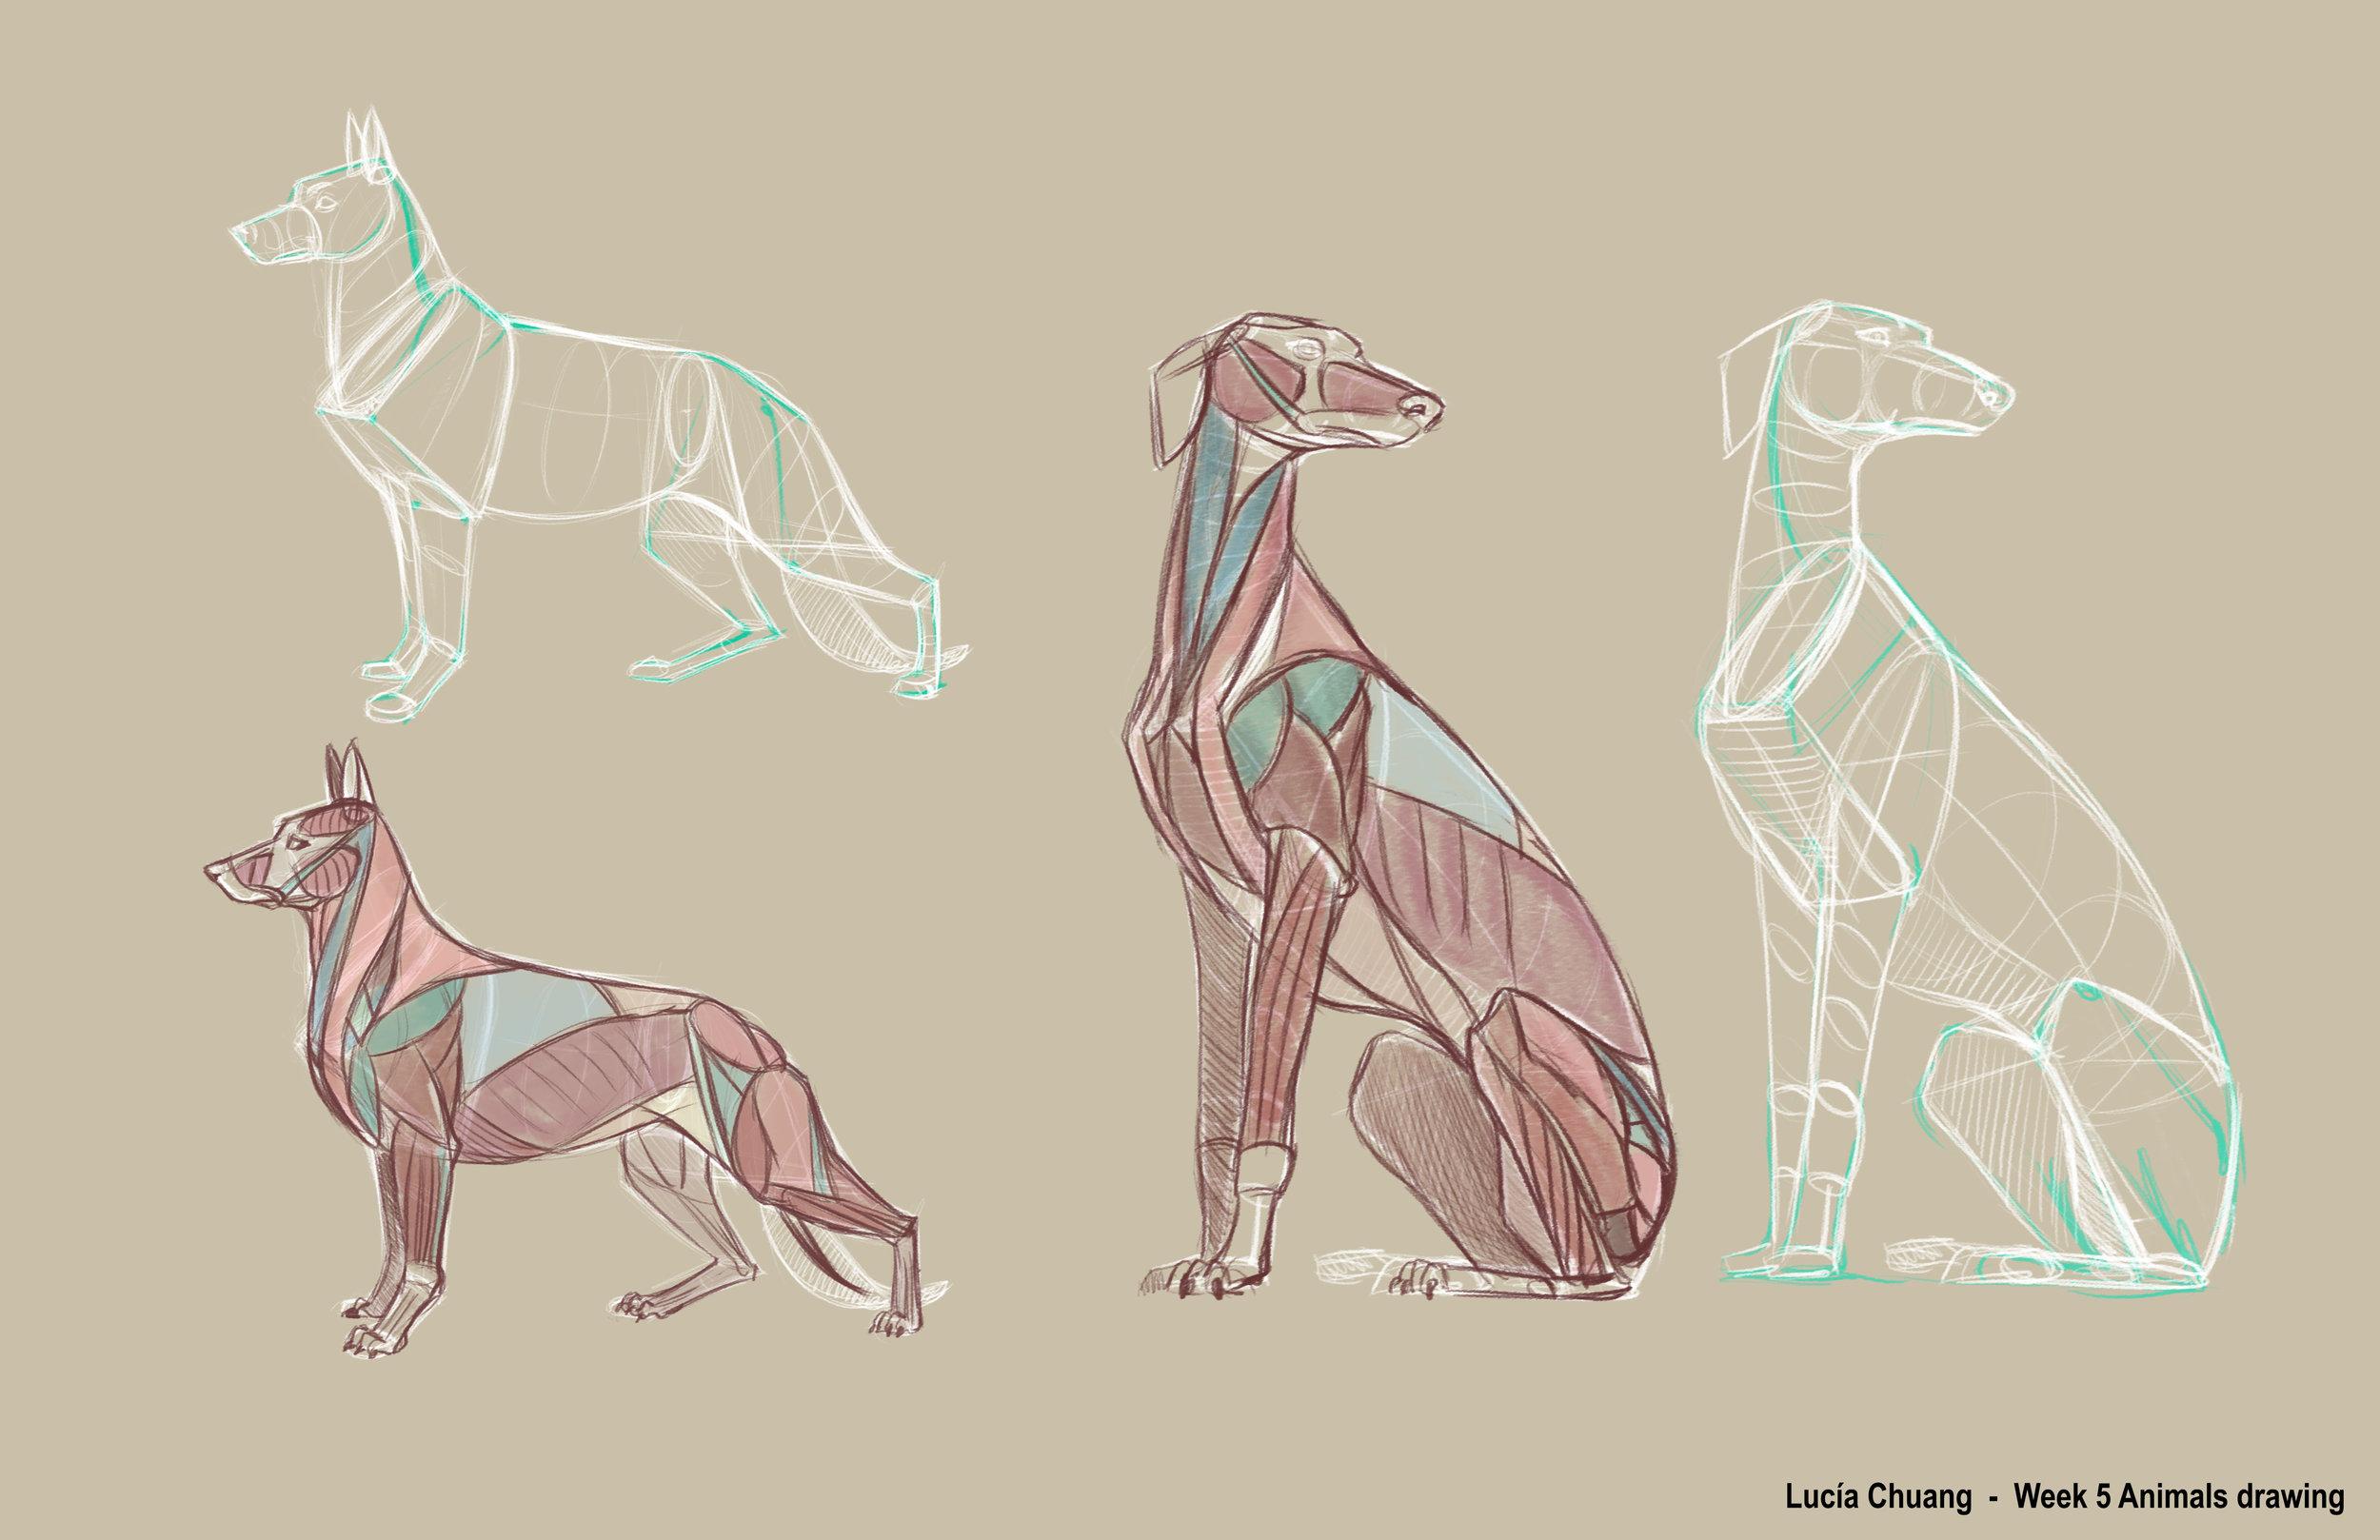 lucia_chuang-animal_drawing_-wk5-1011807106.jpeg